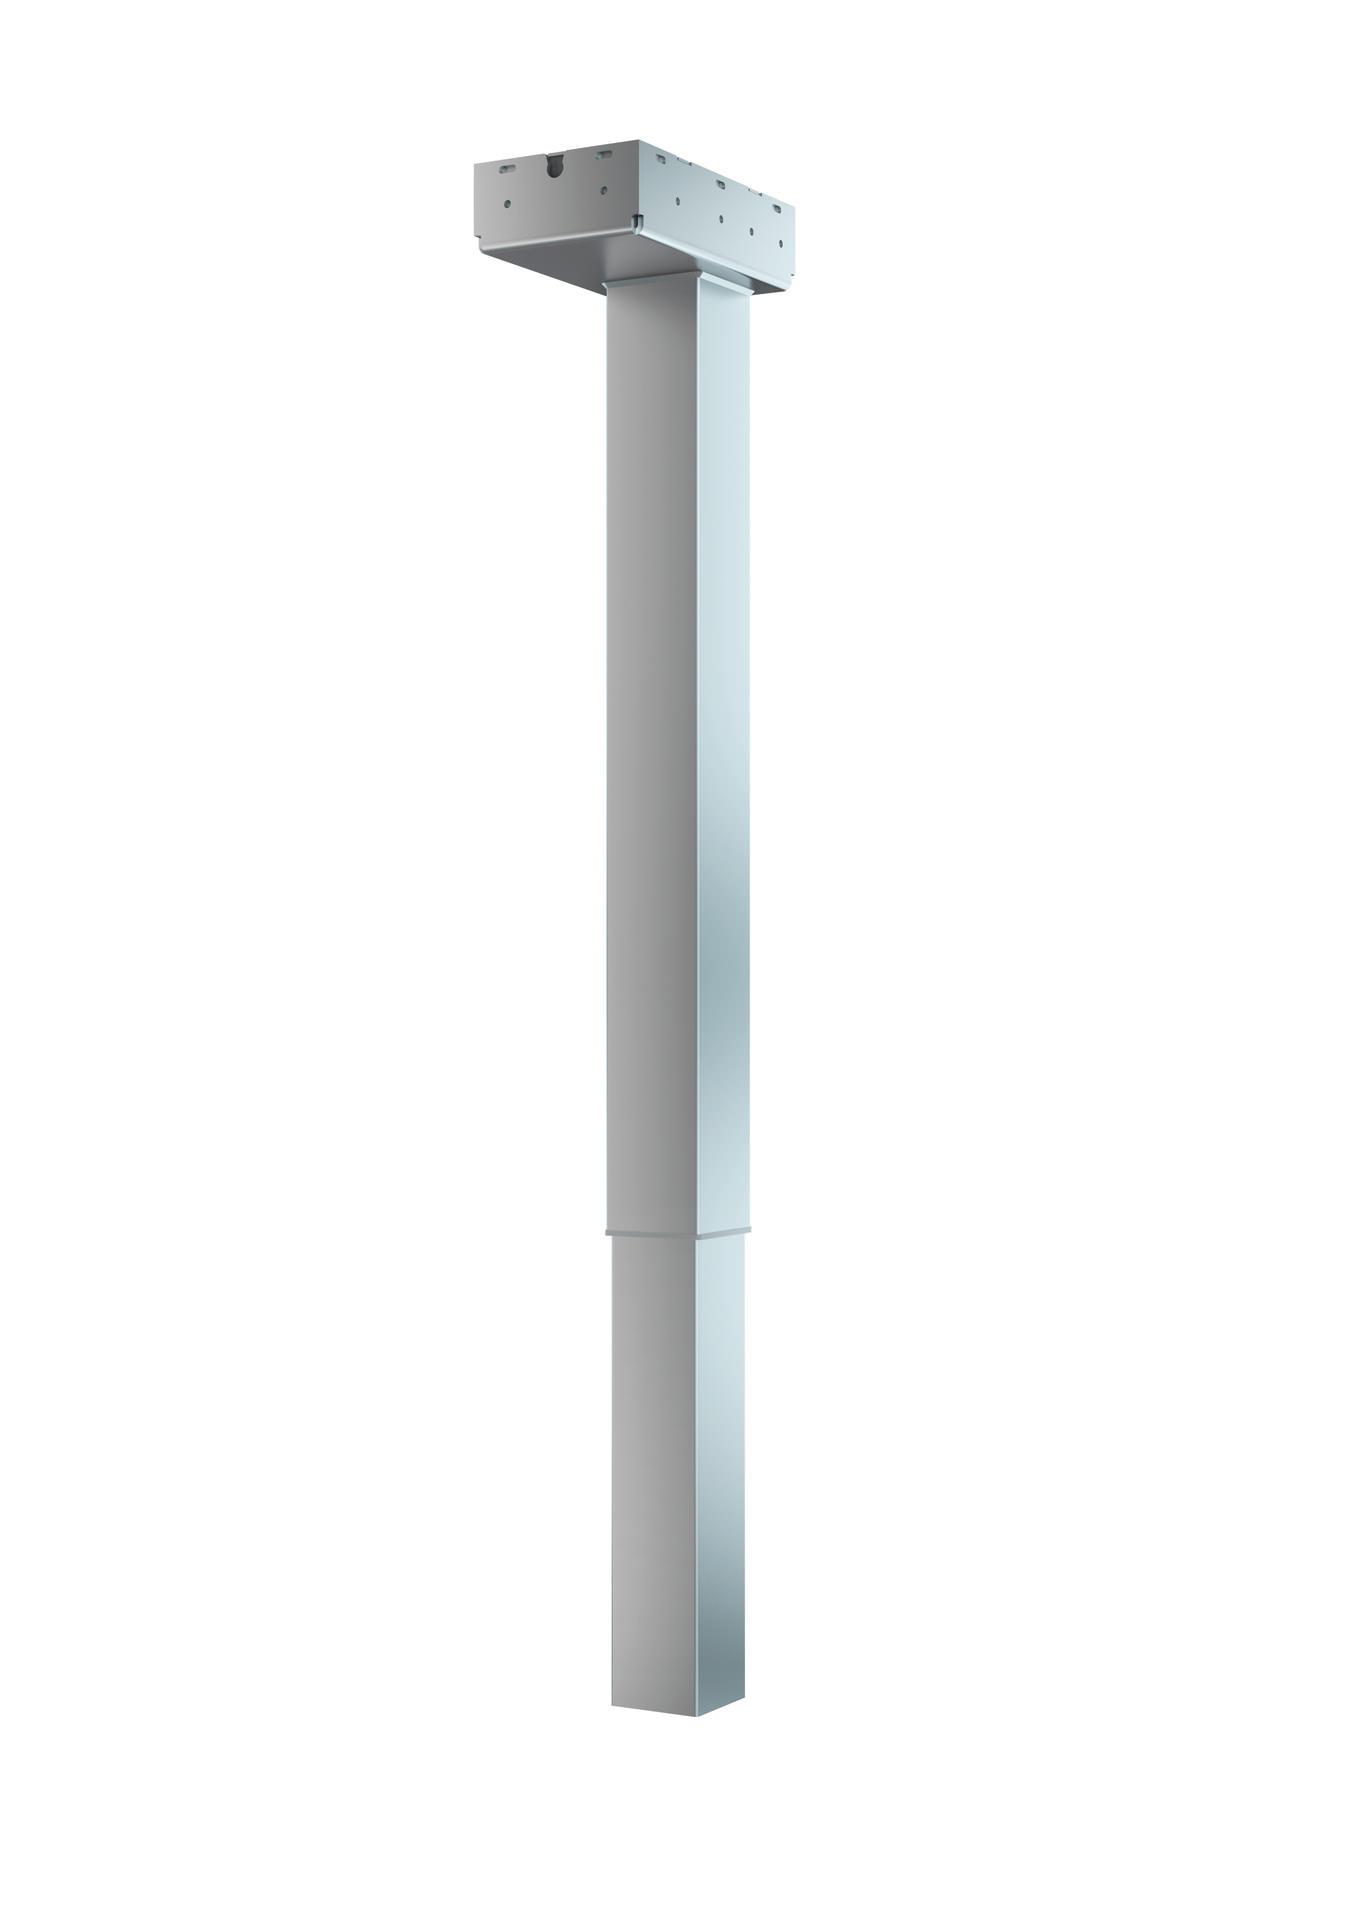 Produktbild: höhenverstellbare Hubsäule